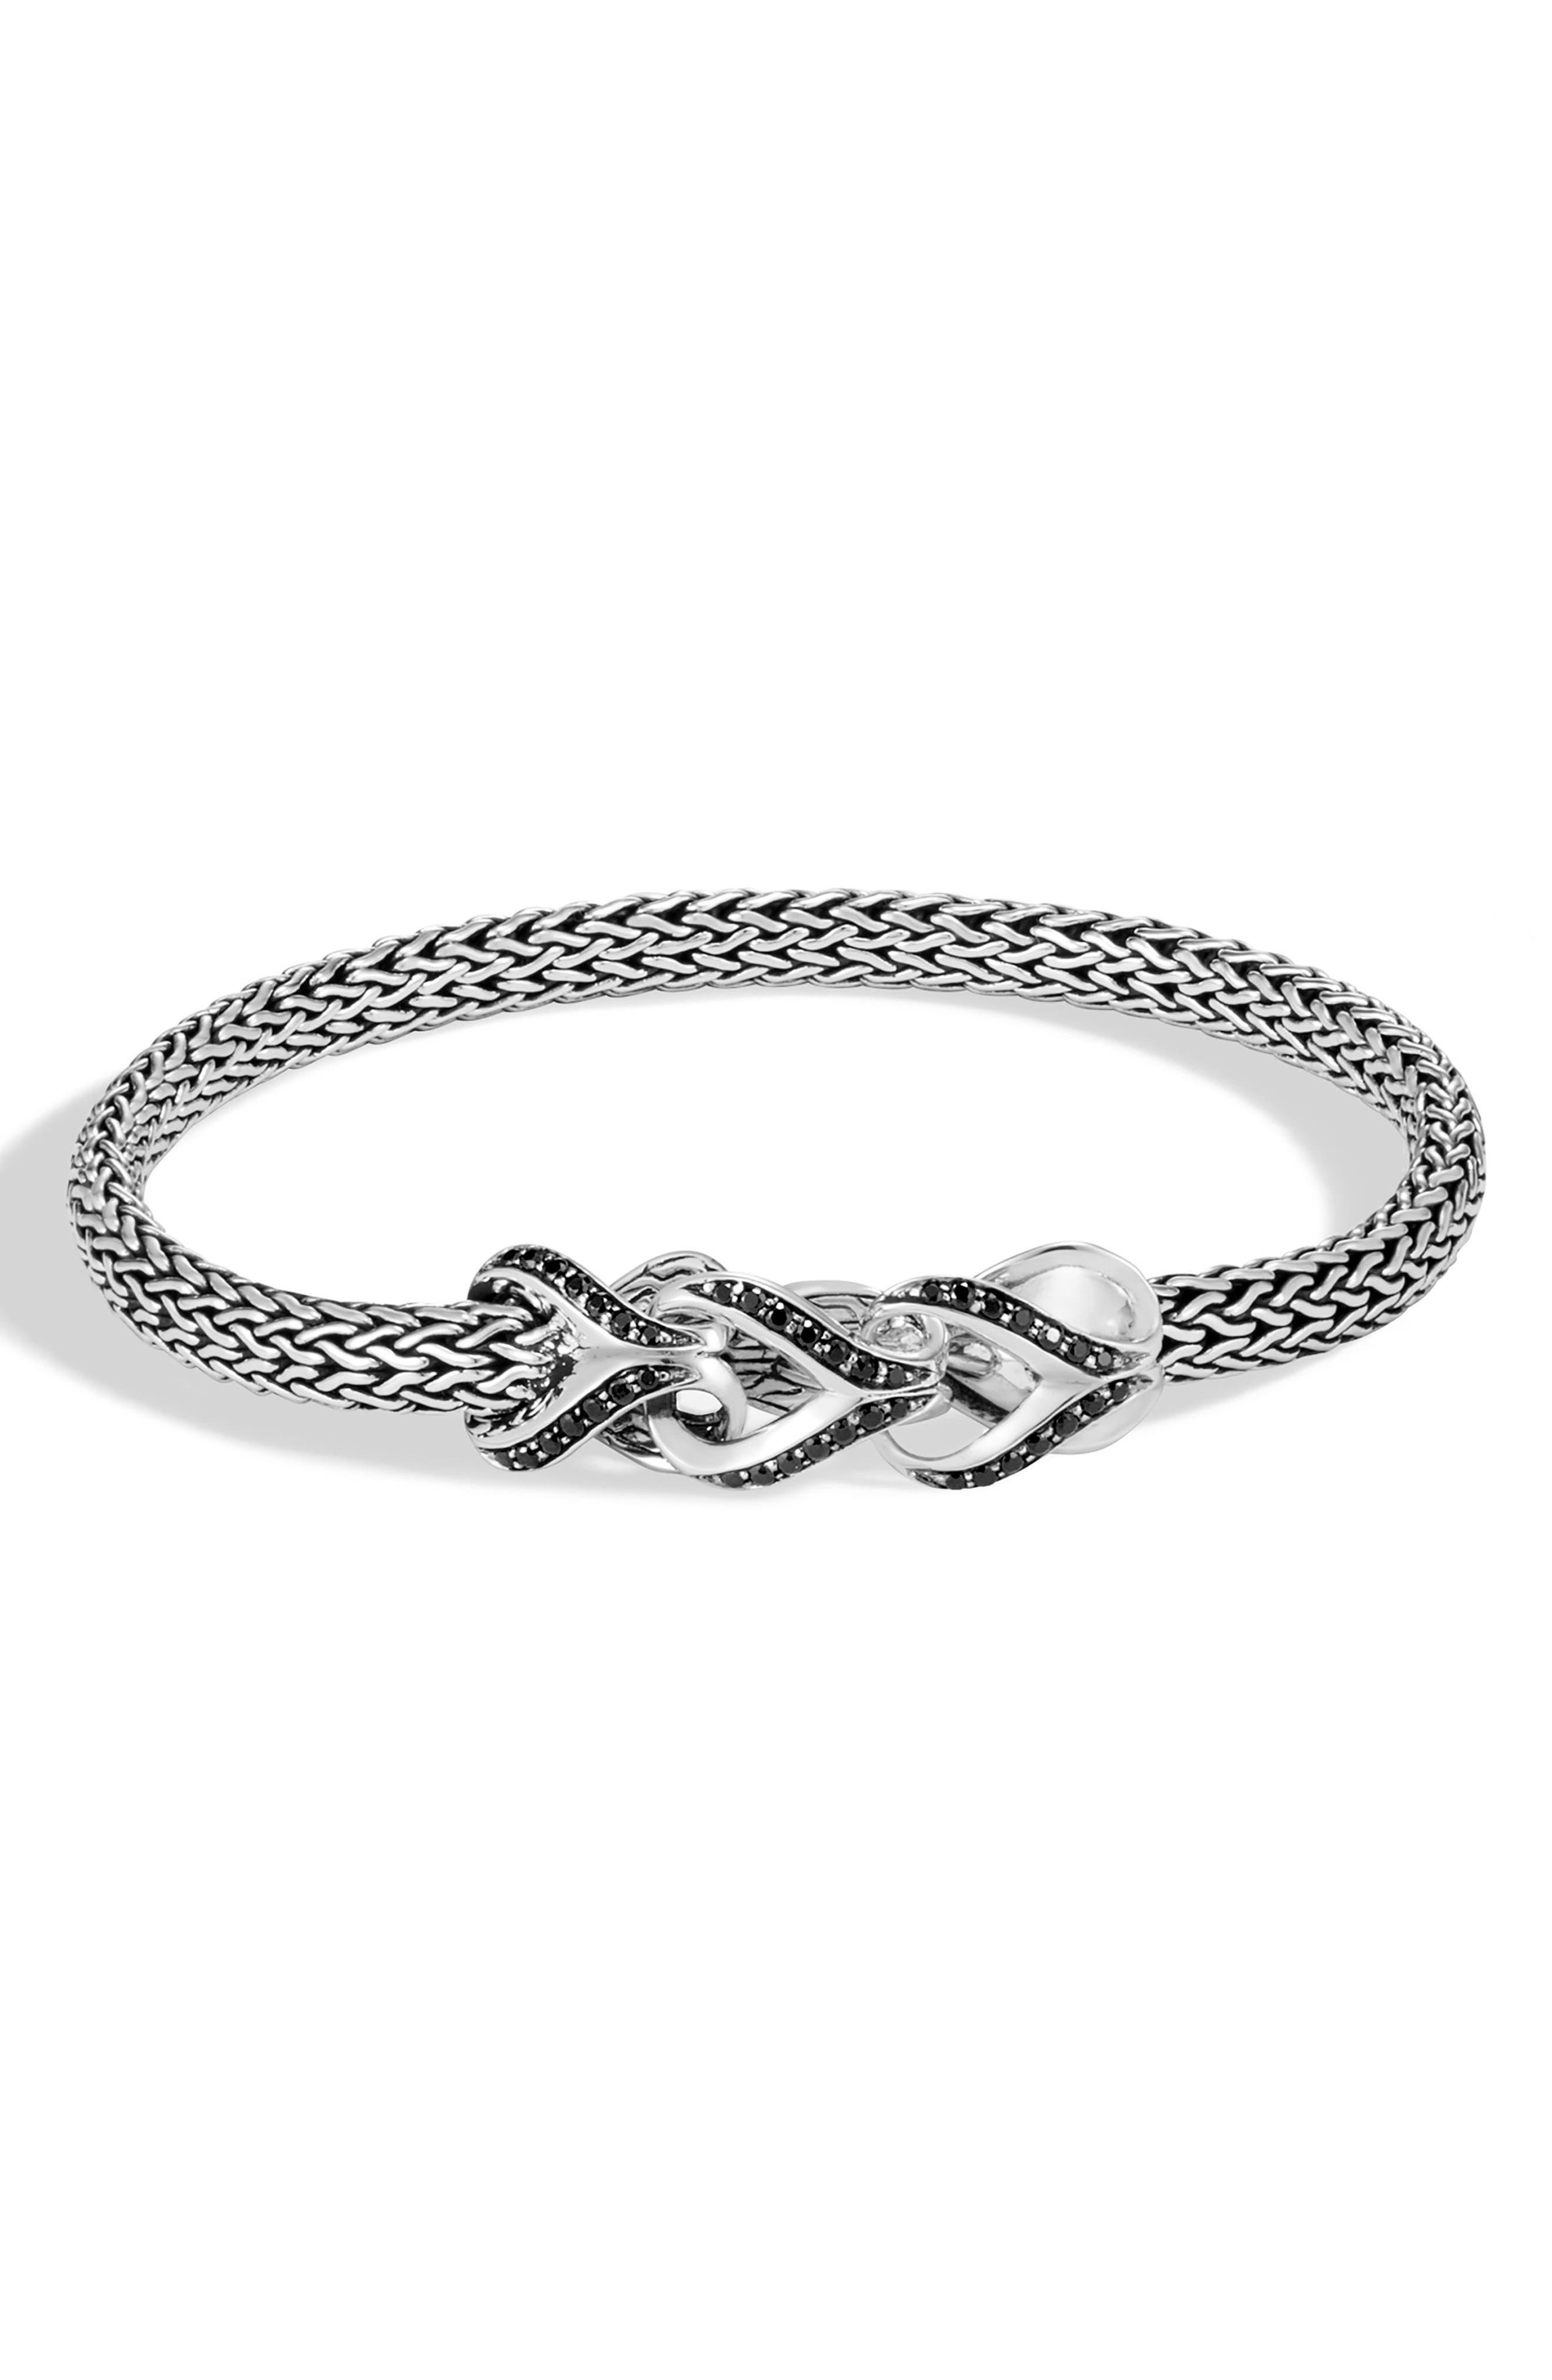 Classic Chain Link 5mm Bracelet,                             Main thumbnail 1, color,                             SILVER